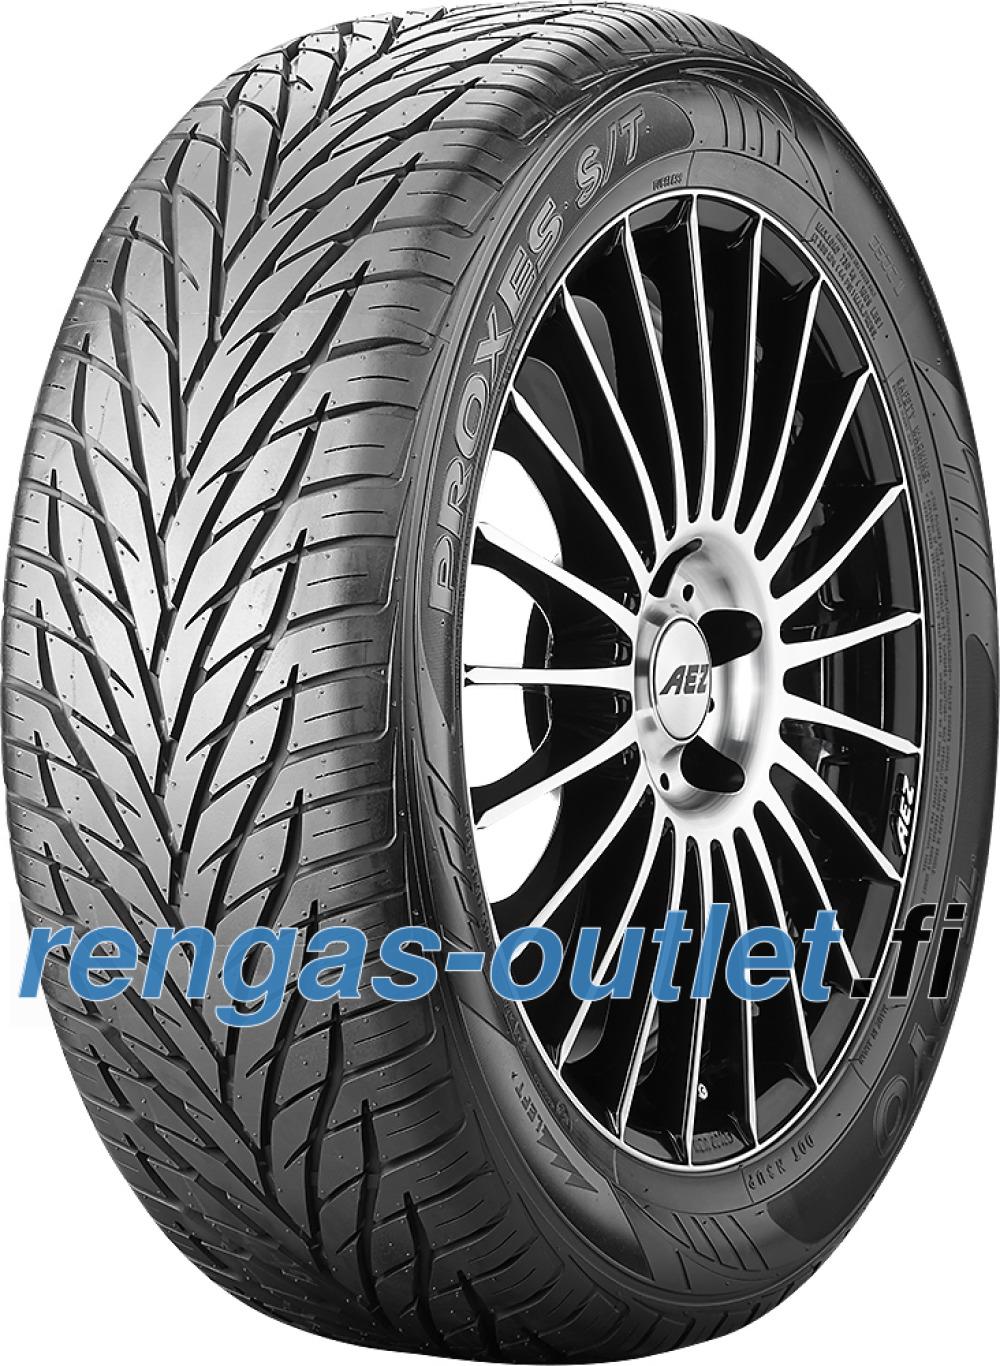 Toyo Proxes S/T ( 265/70 R16 112V RBL )